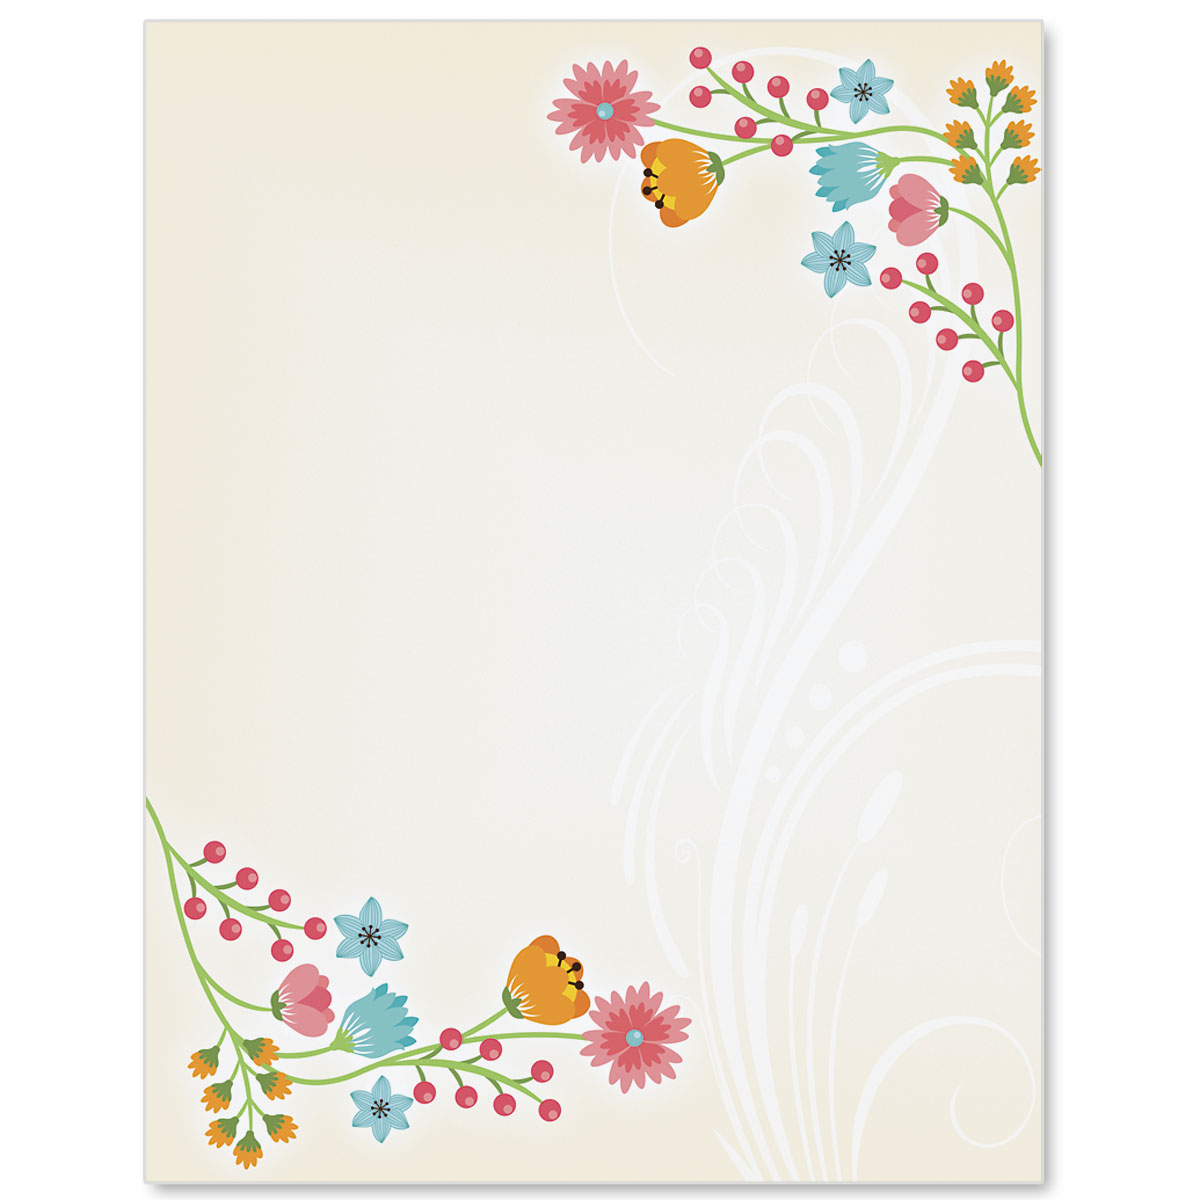 Flower frame border papers paperdirects flower frame border papers mightylinksfo